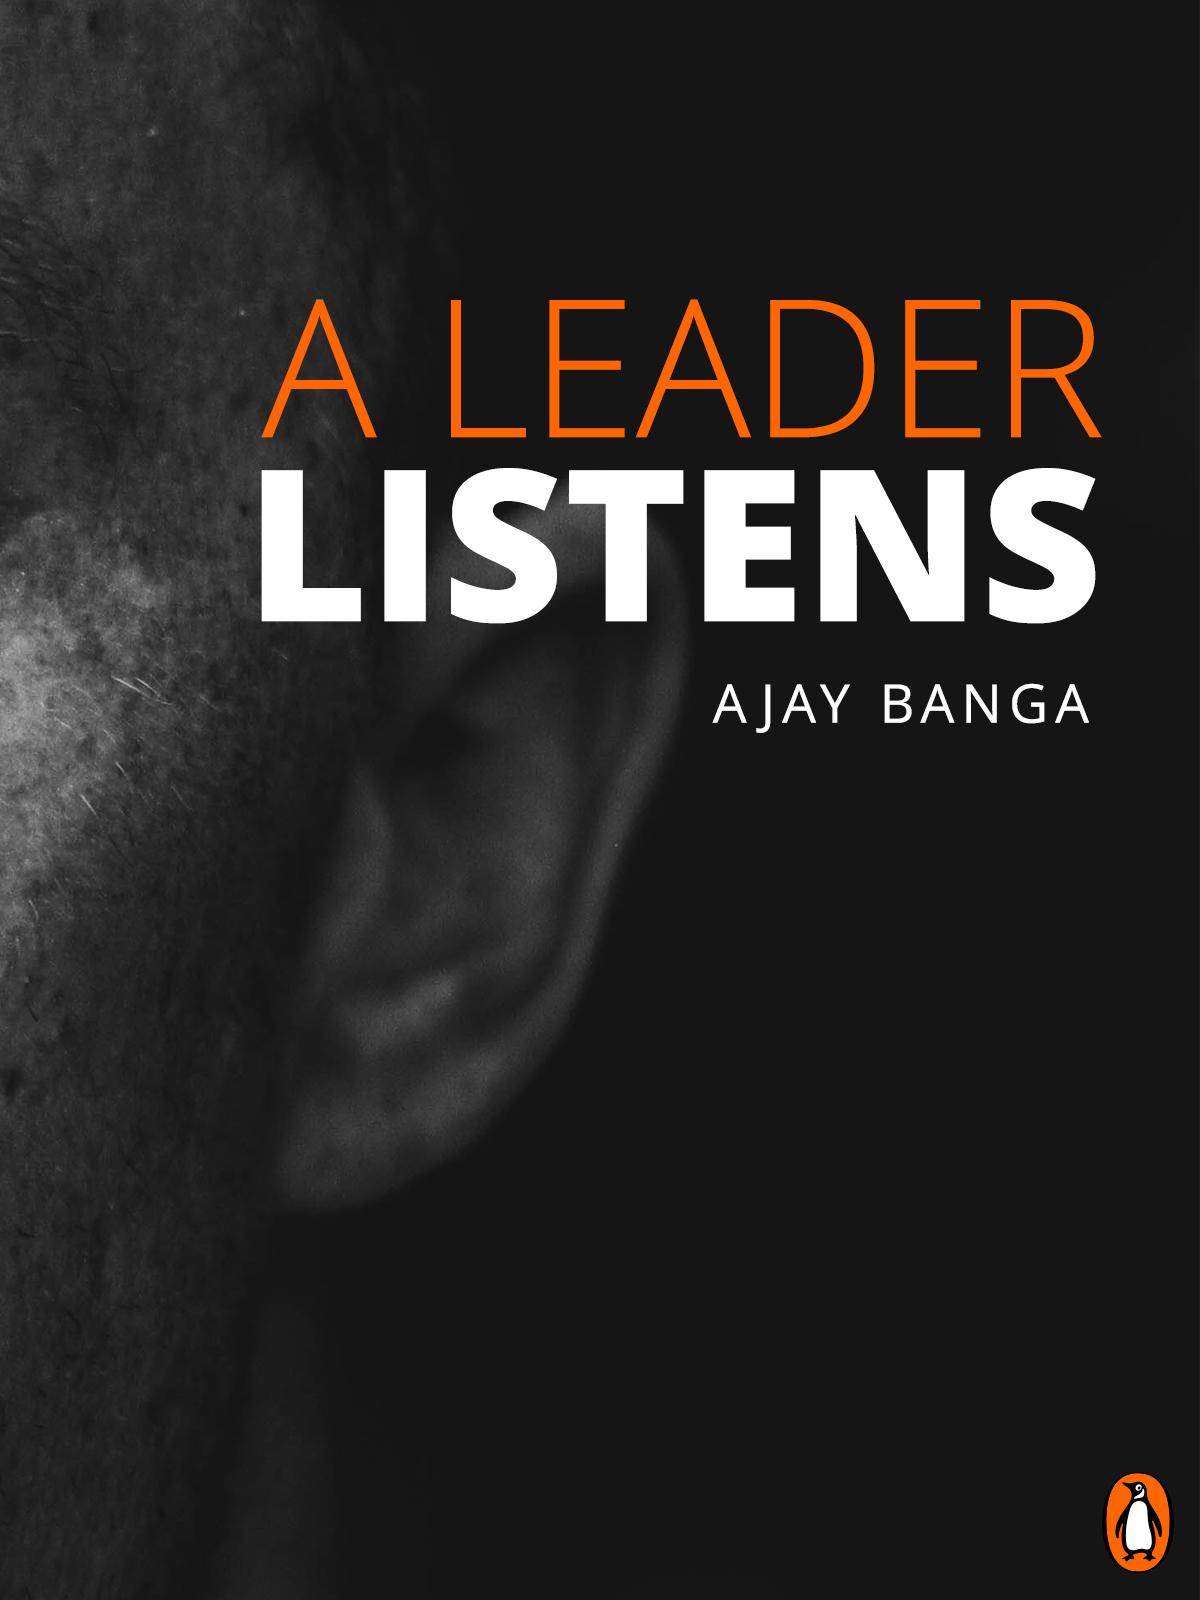 A Leader Listens